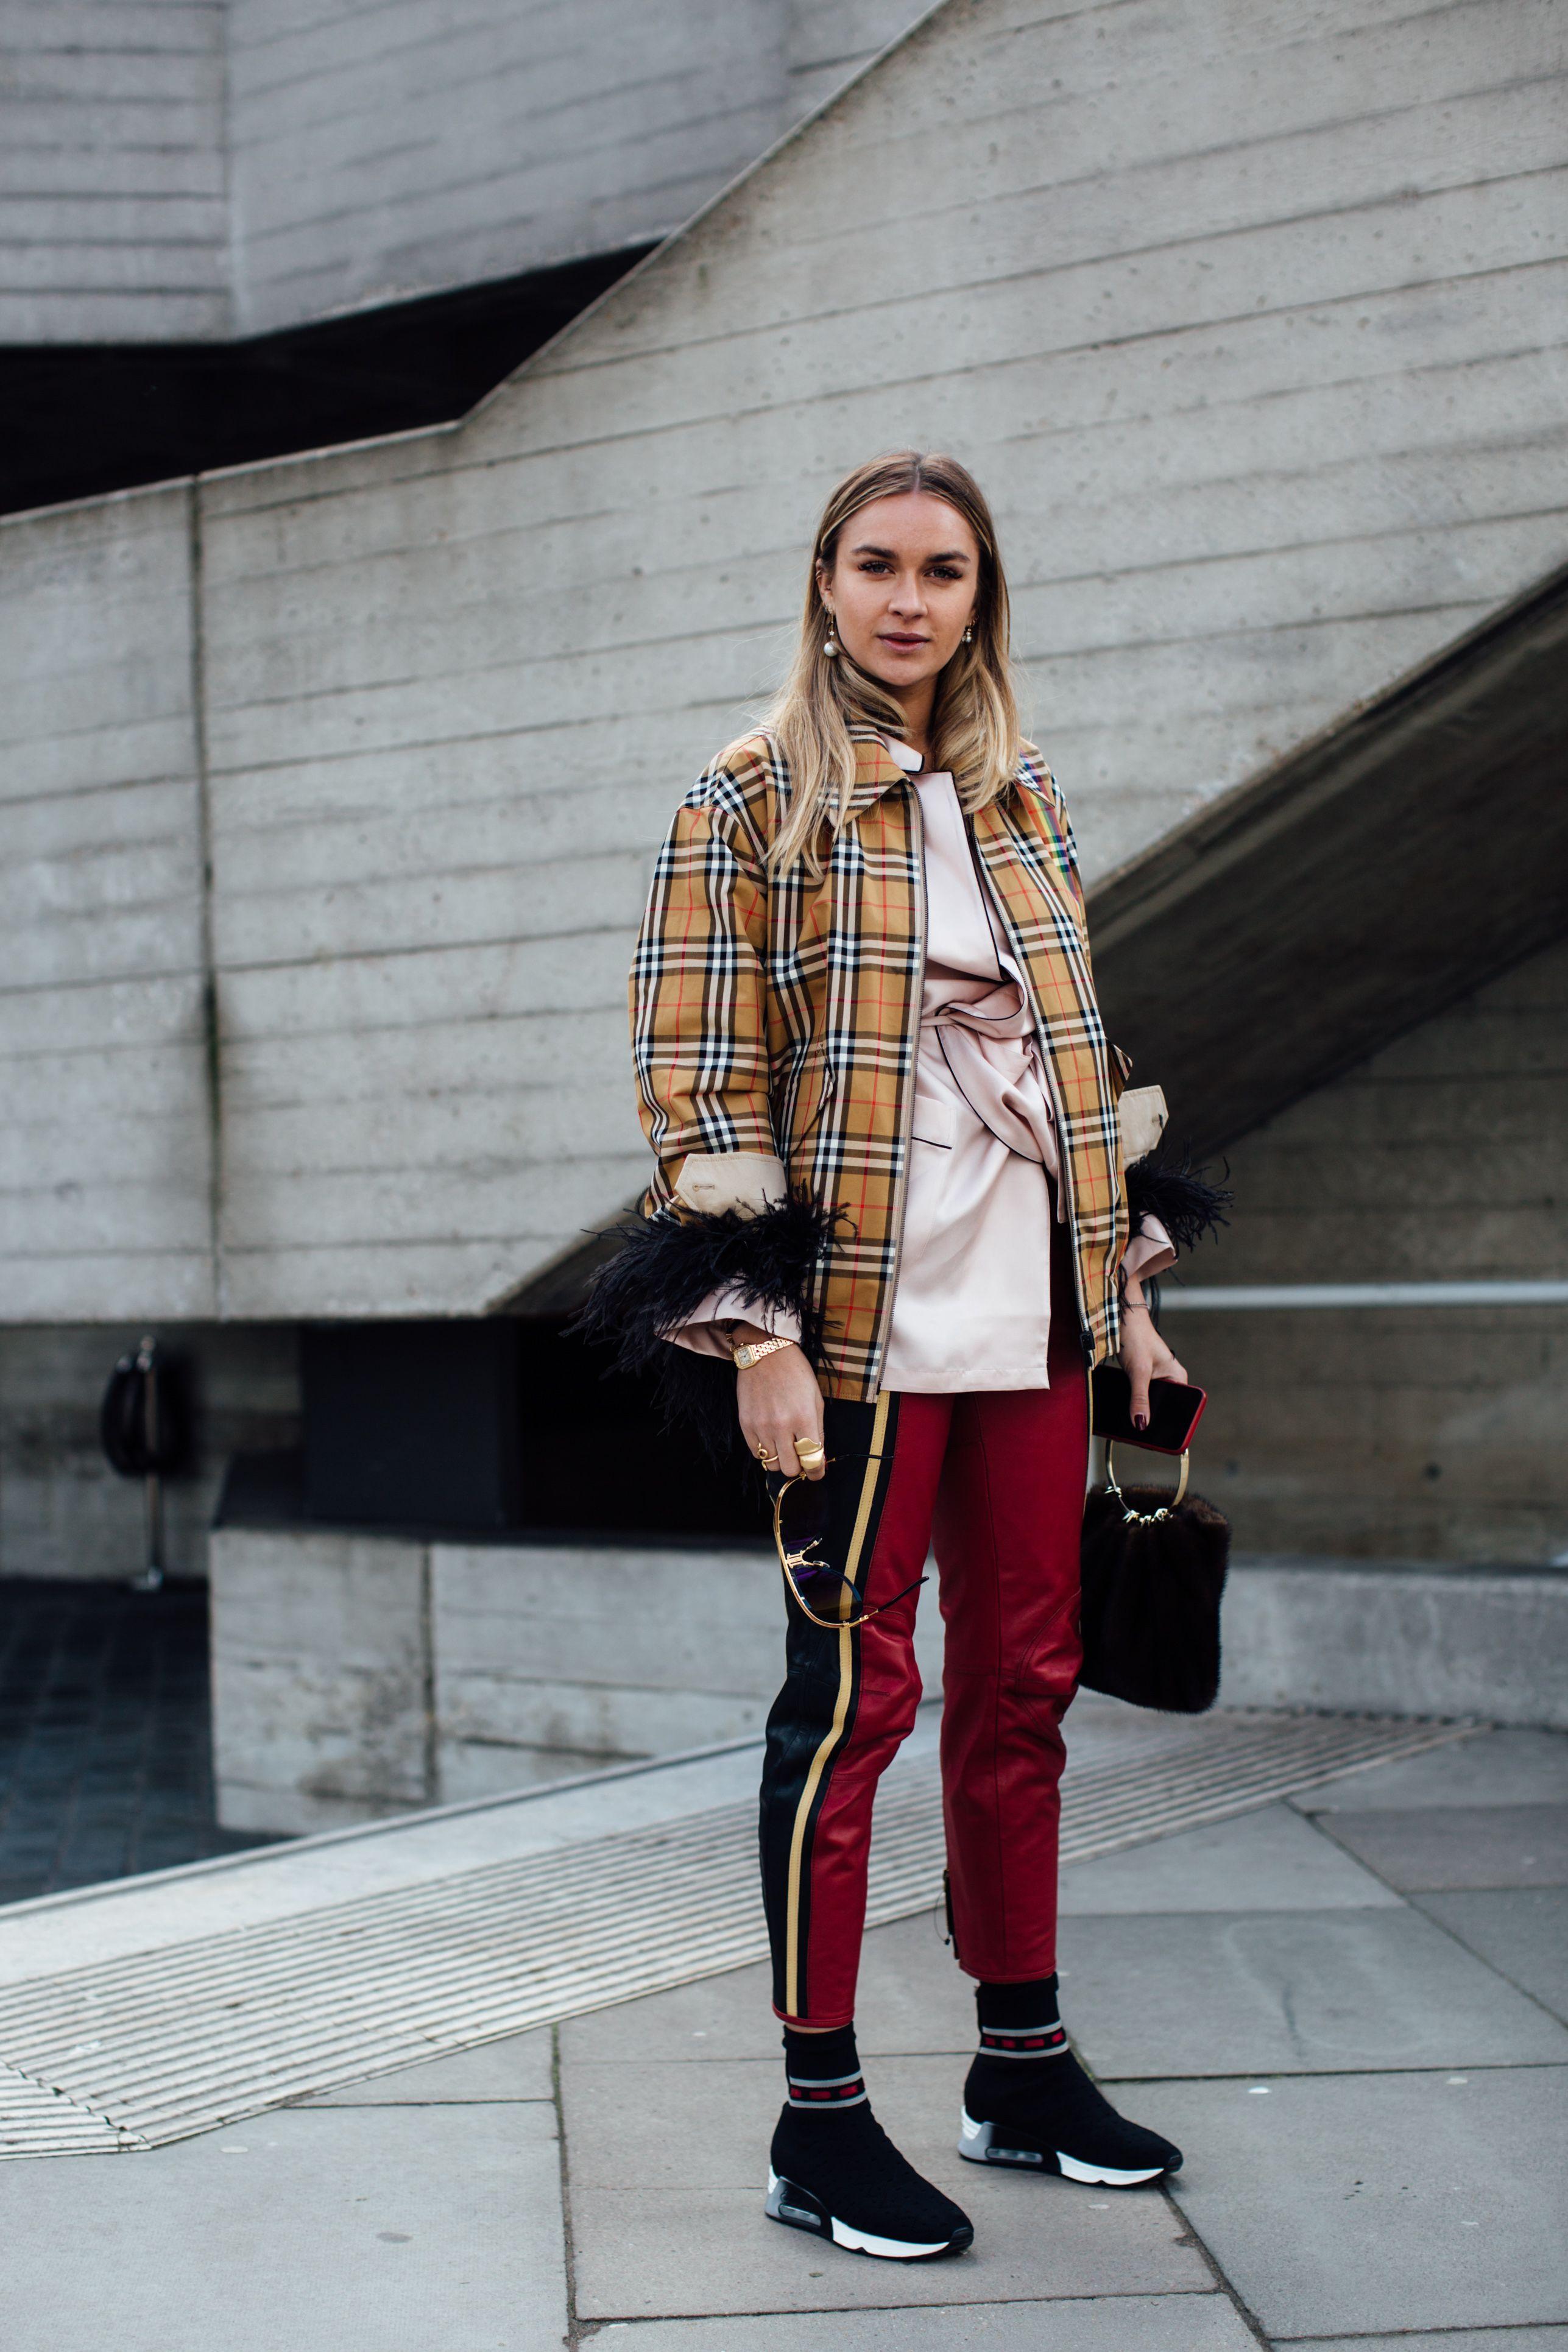 Trackpants 2020 der sportliche Hosentrend | London fashion